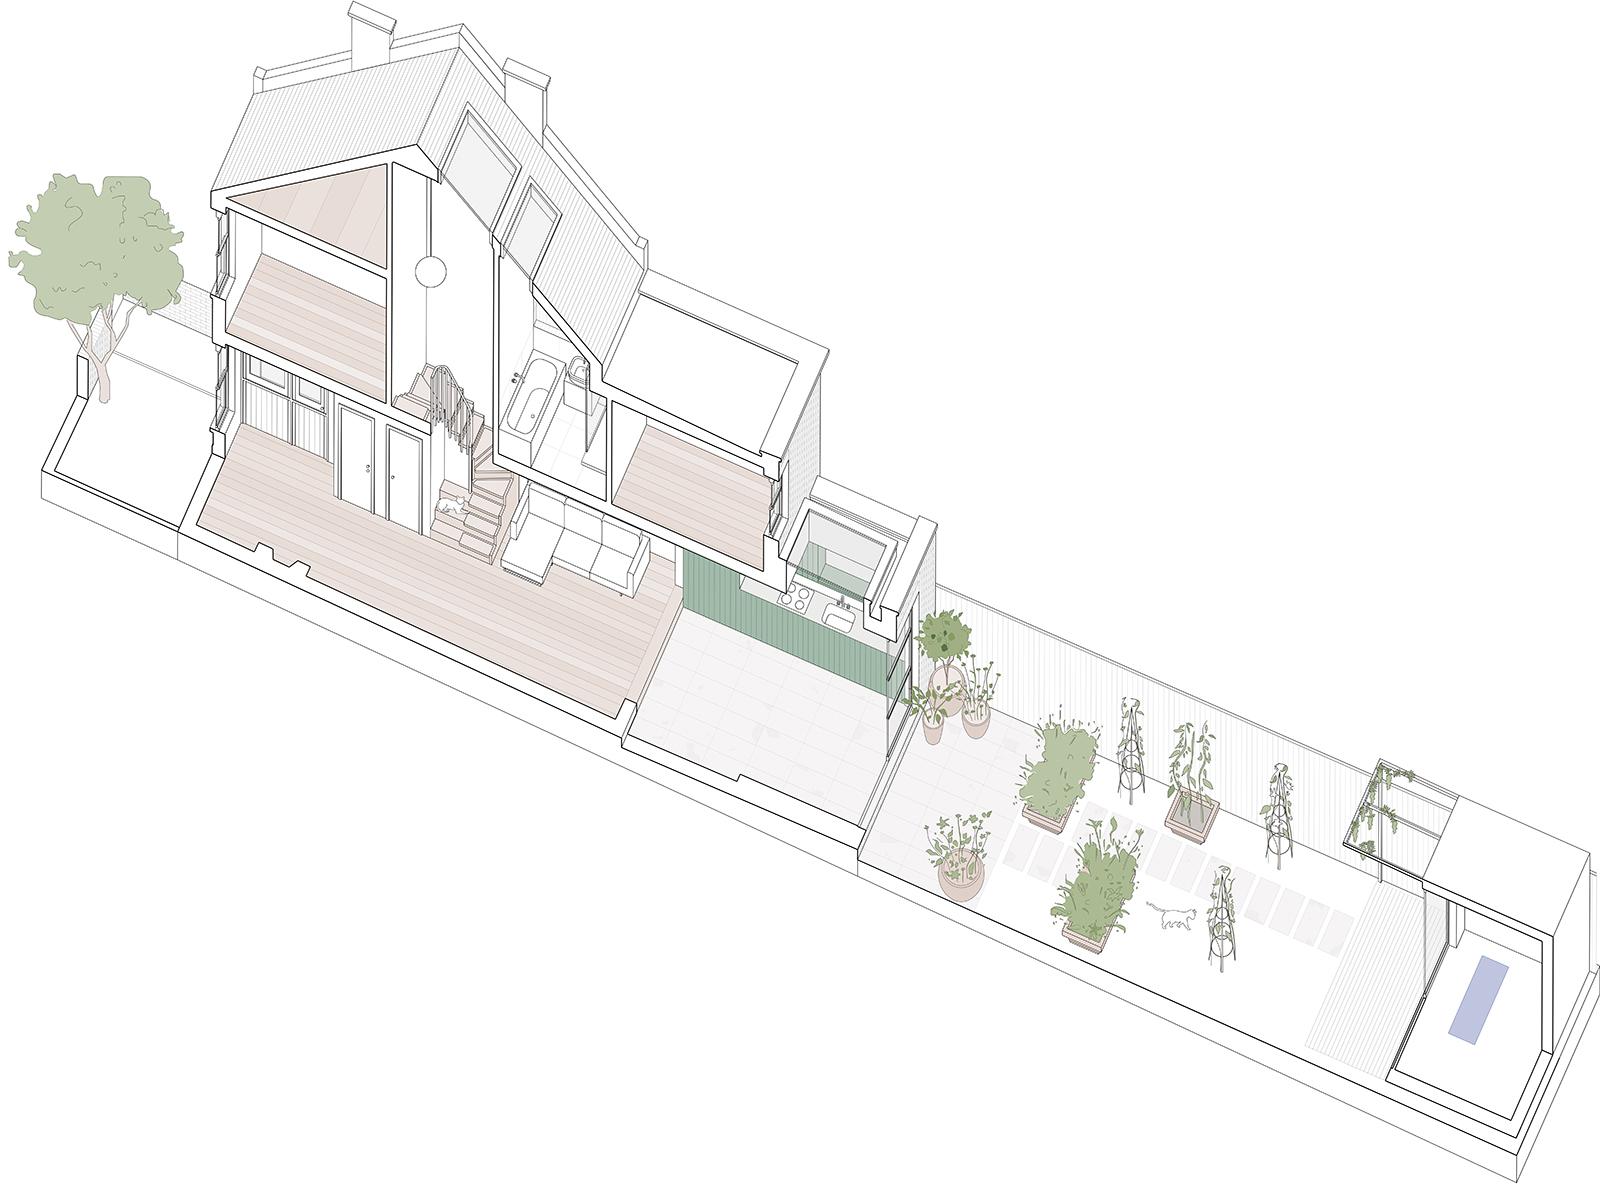 South London Cottage: axonometric drawing